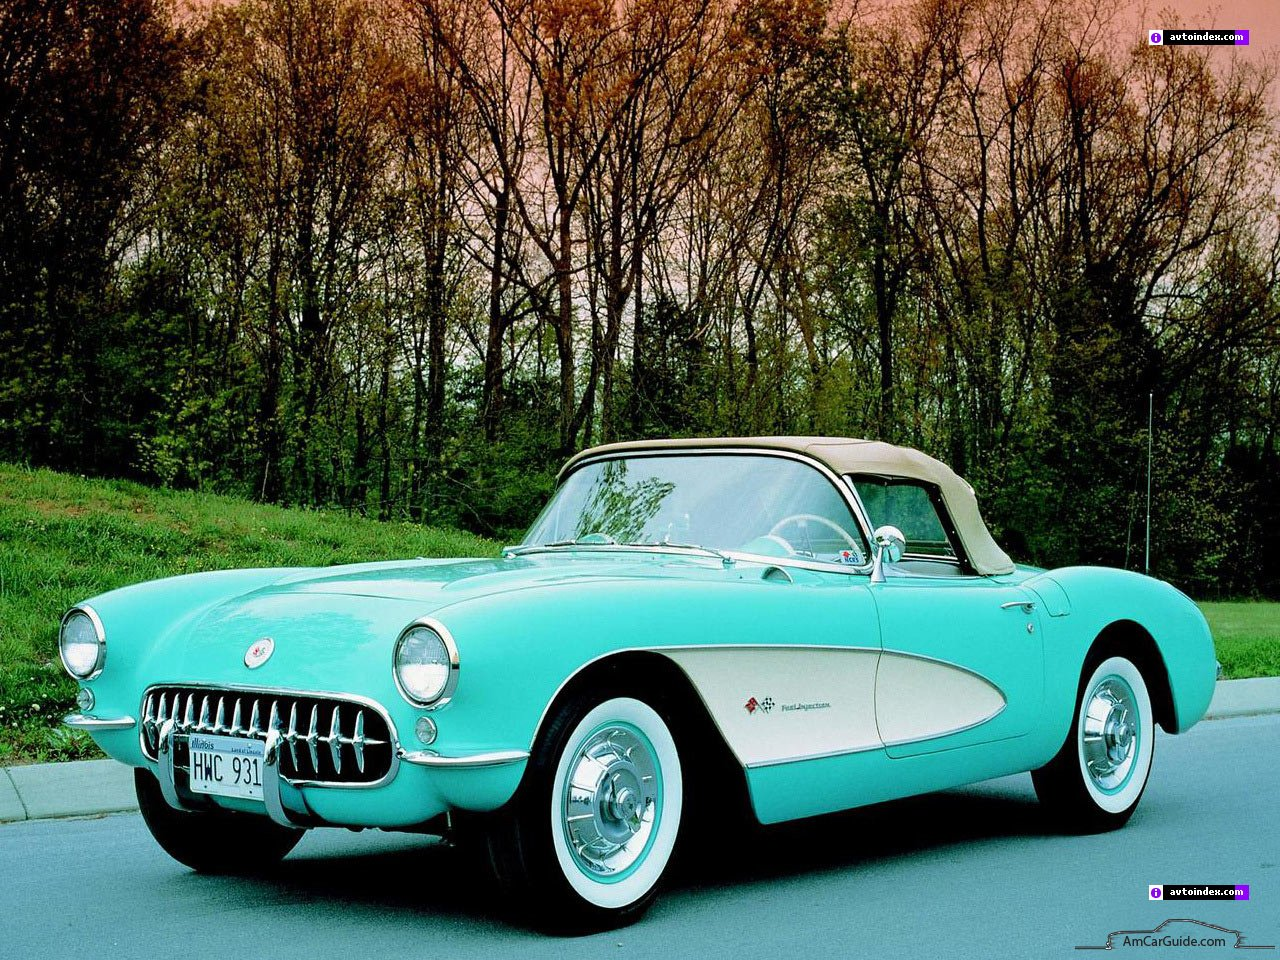 Chevrolet Corvette C1 1953 - 1962 Cabriolet #1